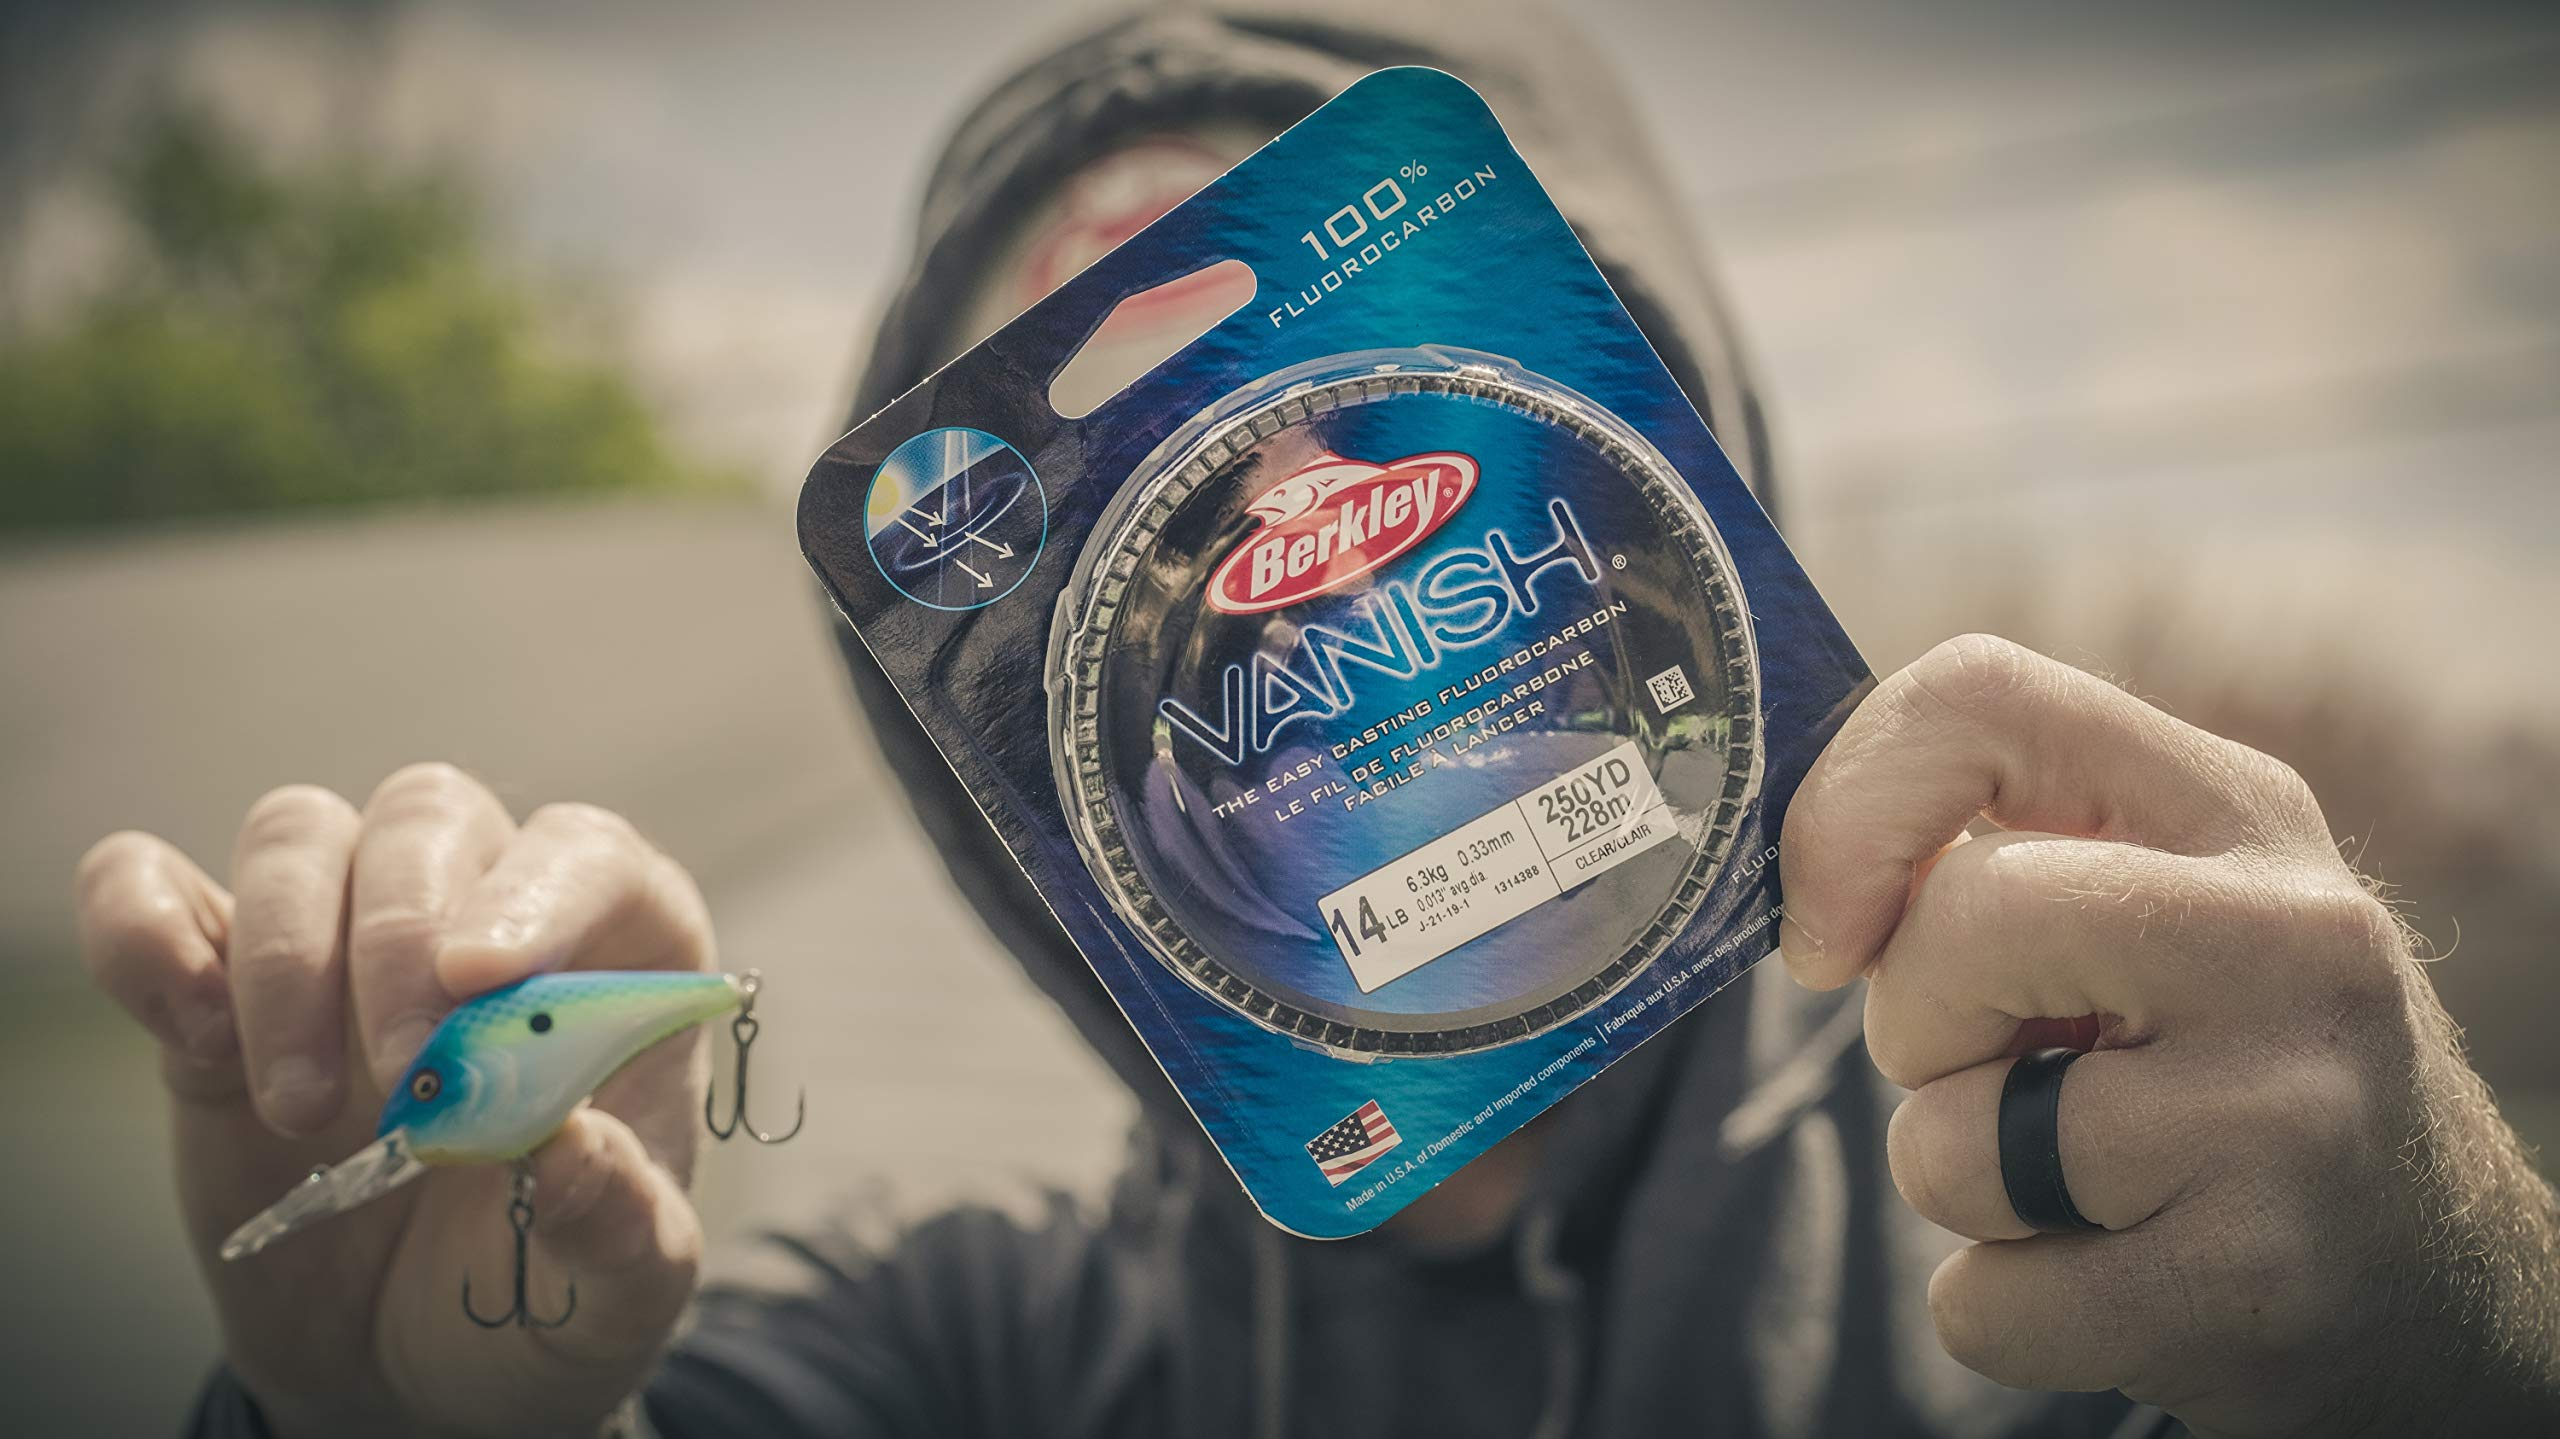 Berkley Vanish Fluorocarbon Fishing Line/Leader Material